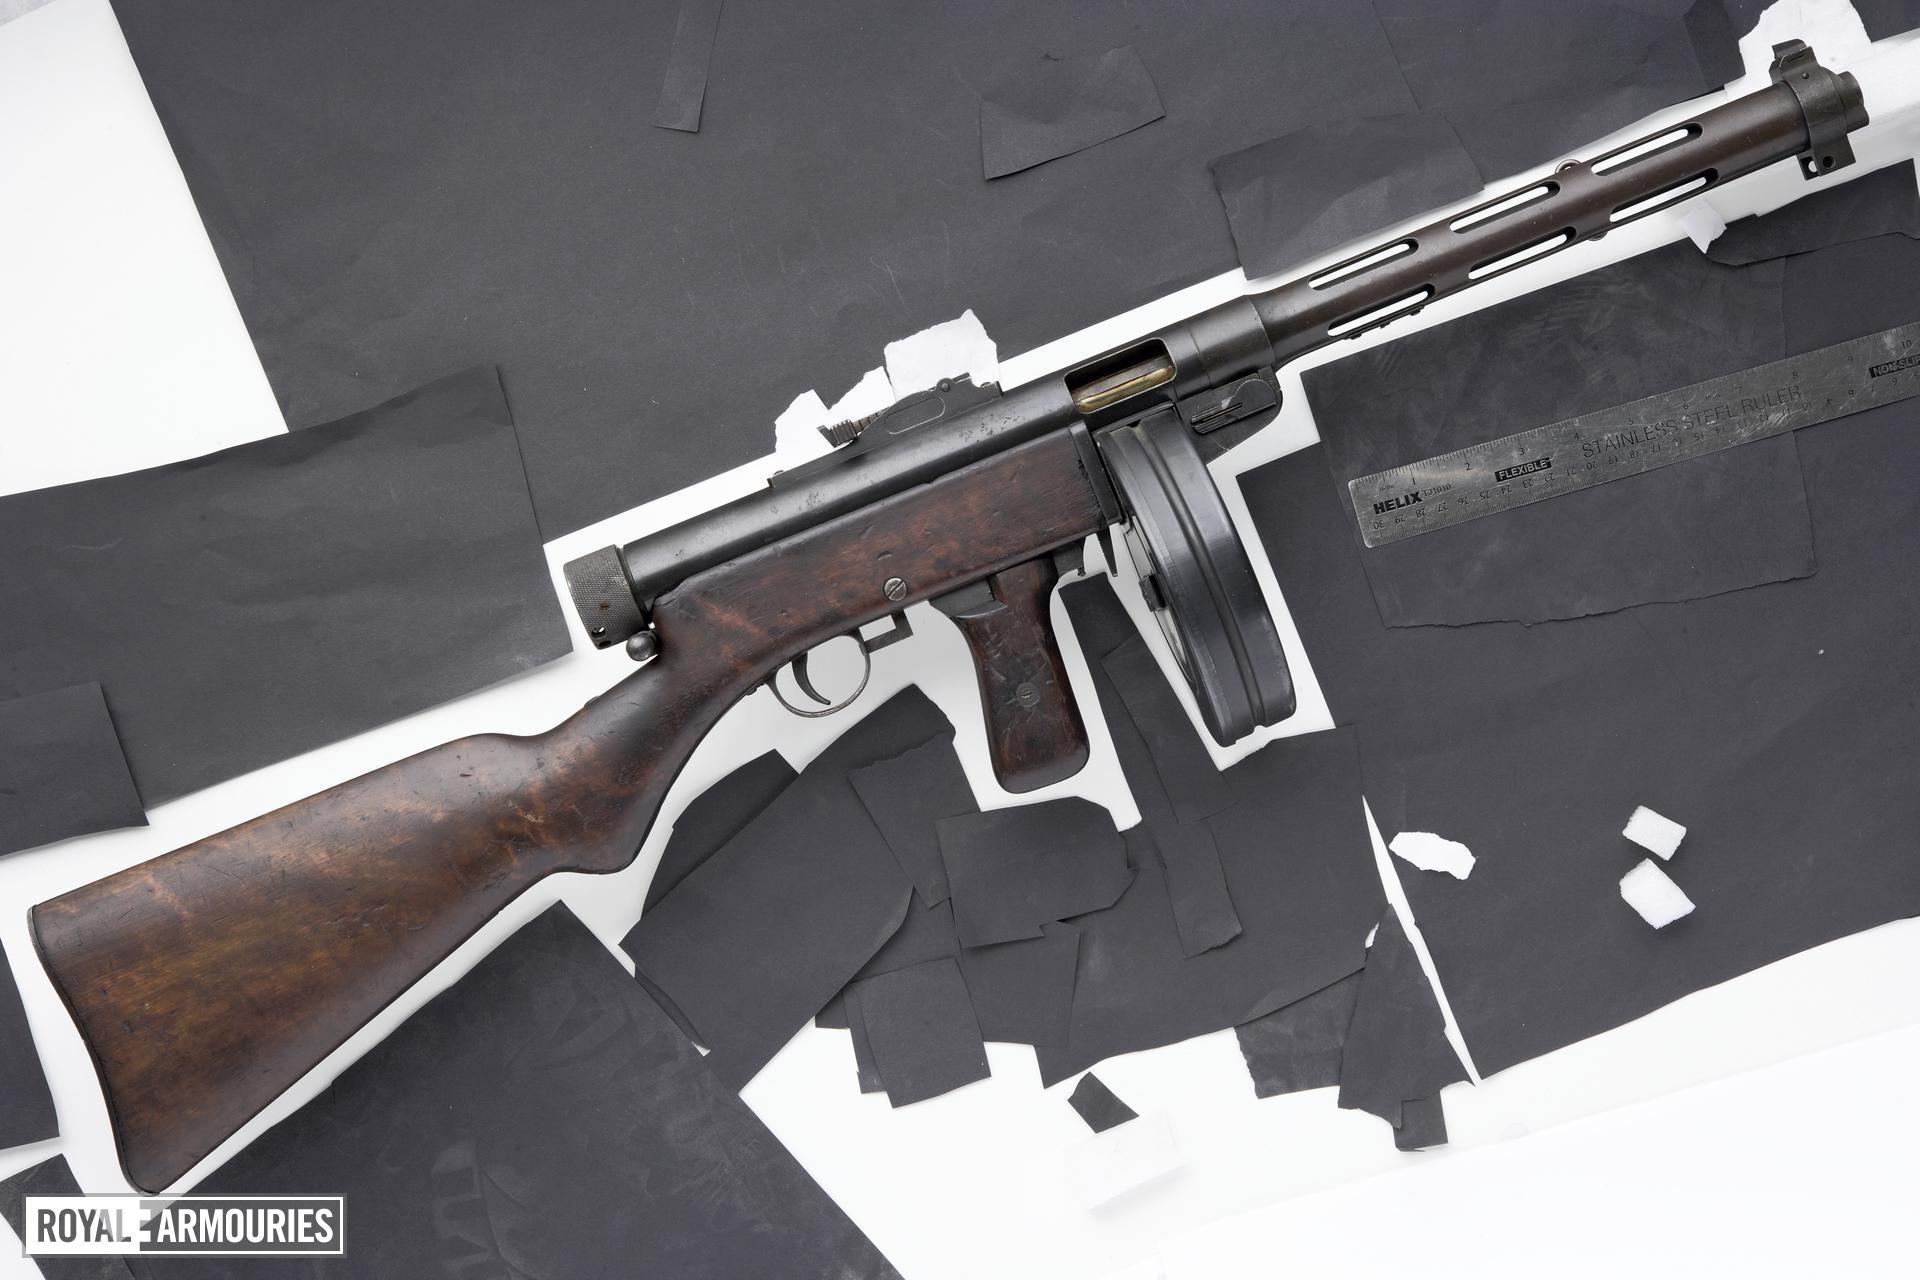 Centrefire automatic submachine gun - Suomi KP M31 Early example.